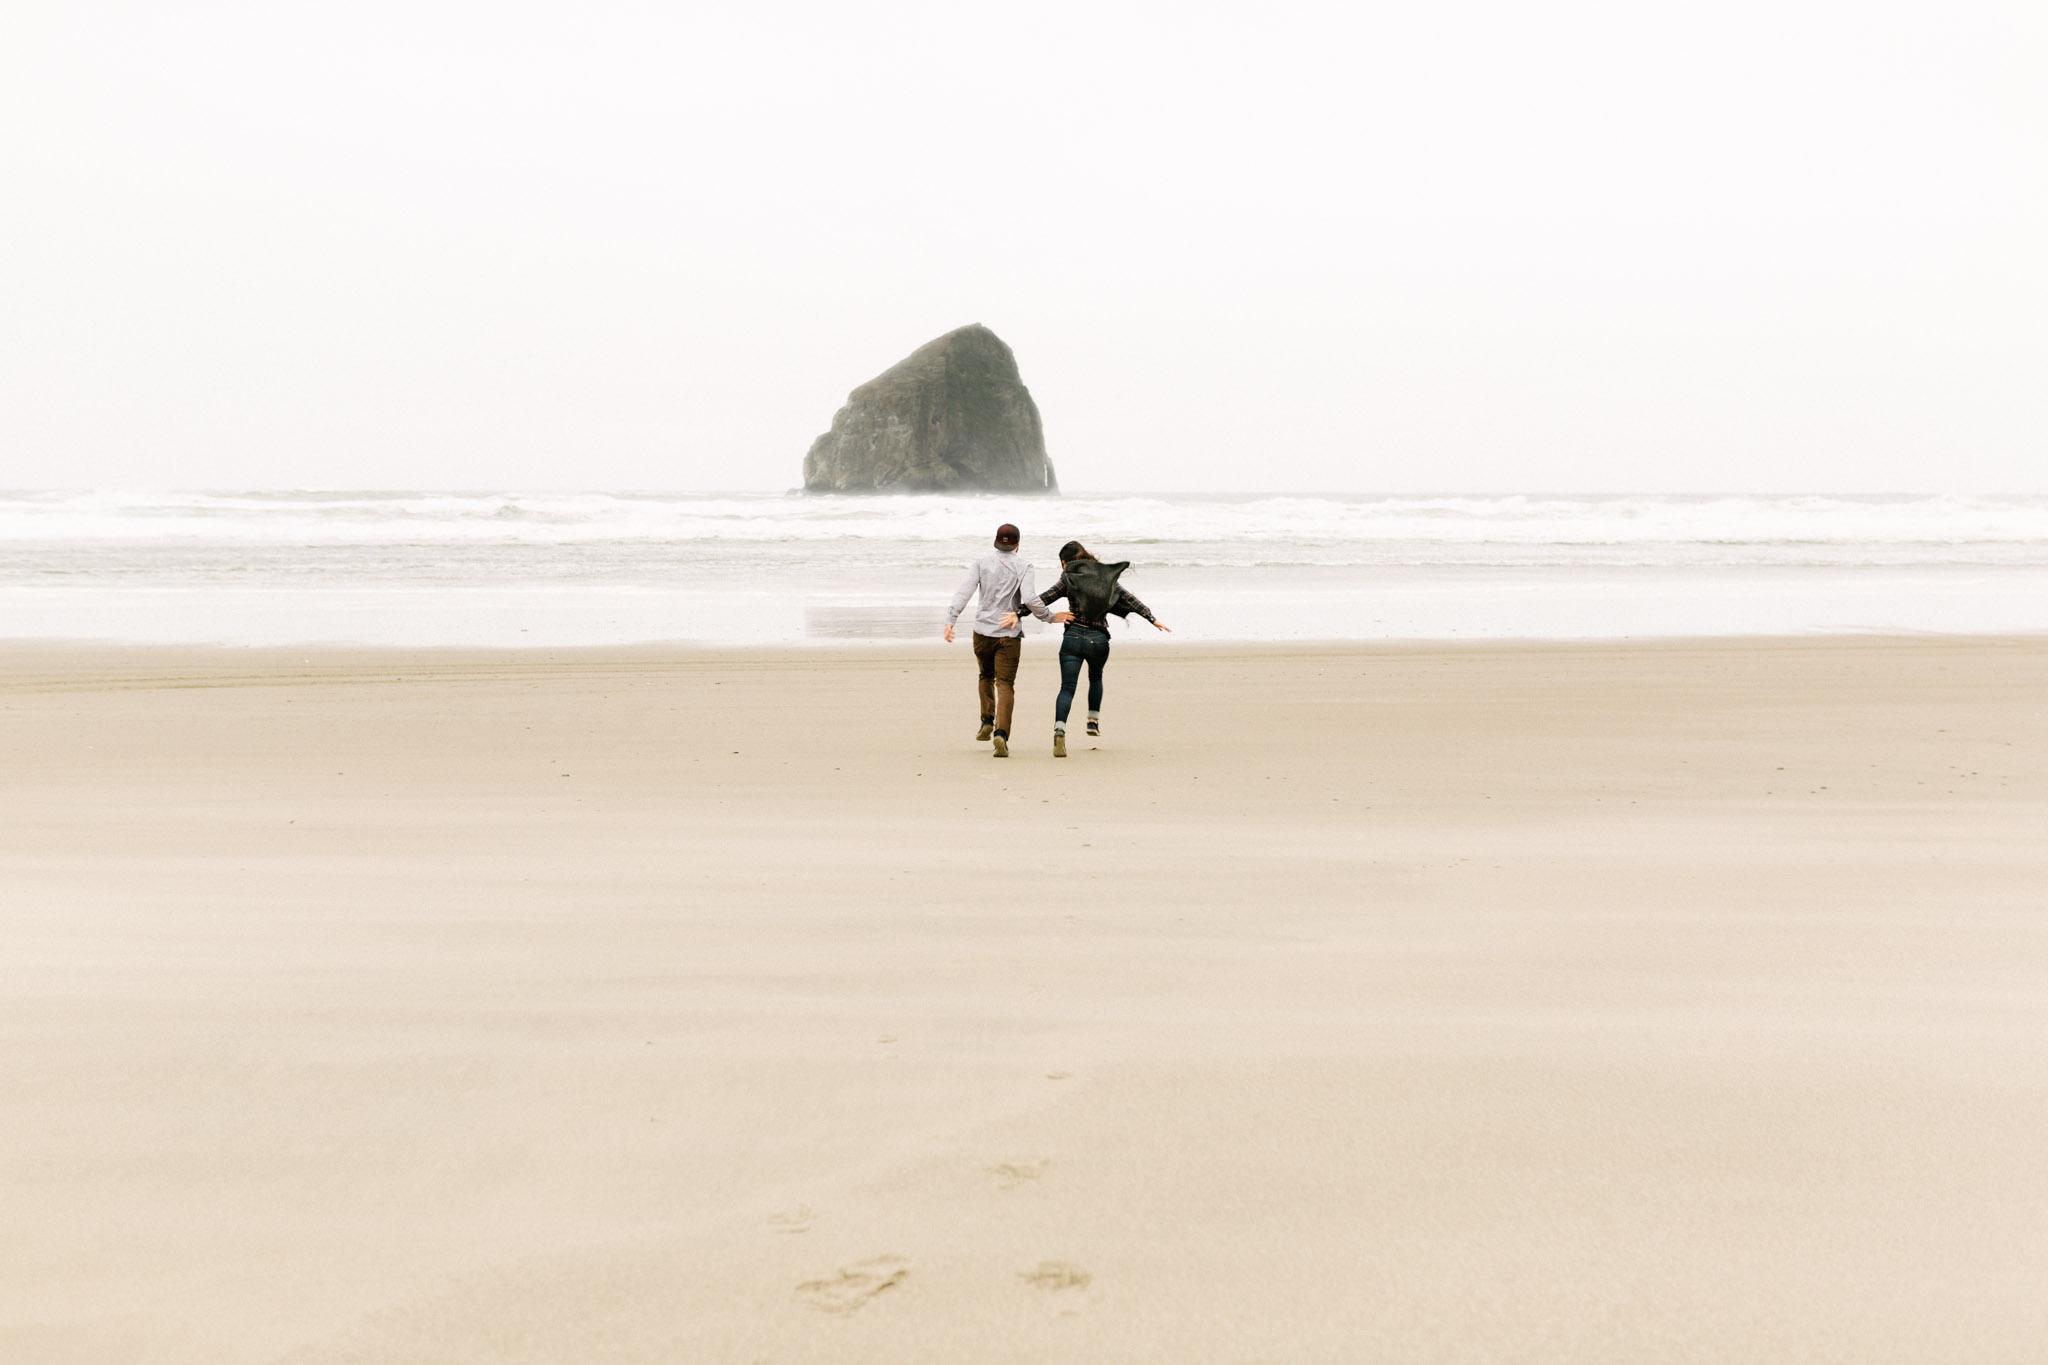 Oregon-Cape-Kiwanda-Engagement-Pia-Anna-Christian-Wedding-Photography-PNW-CJ-36.jpg